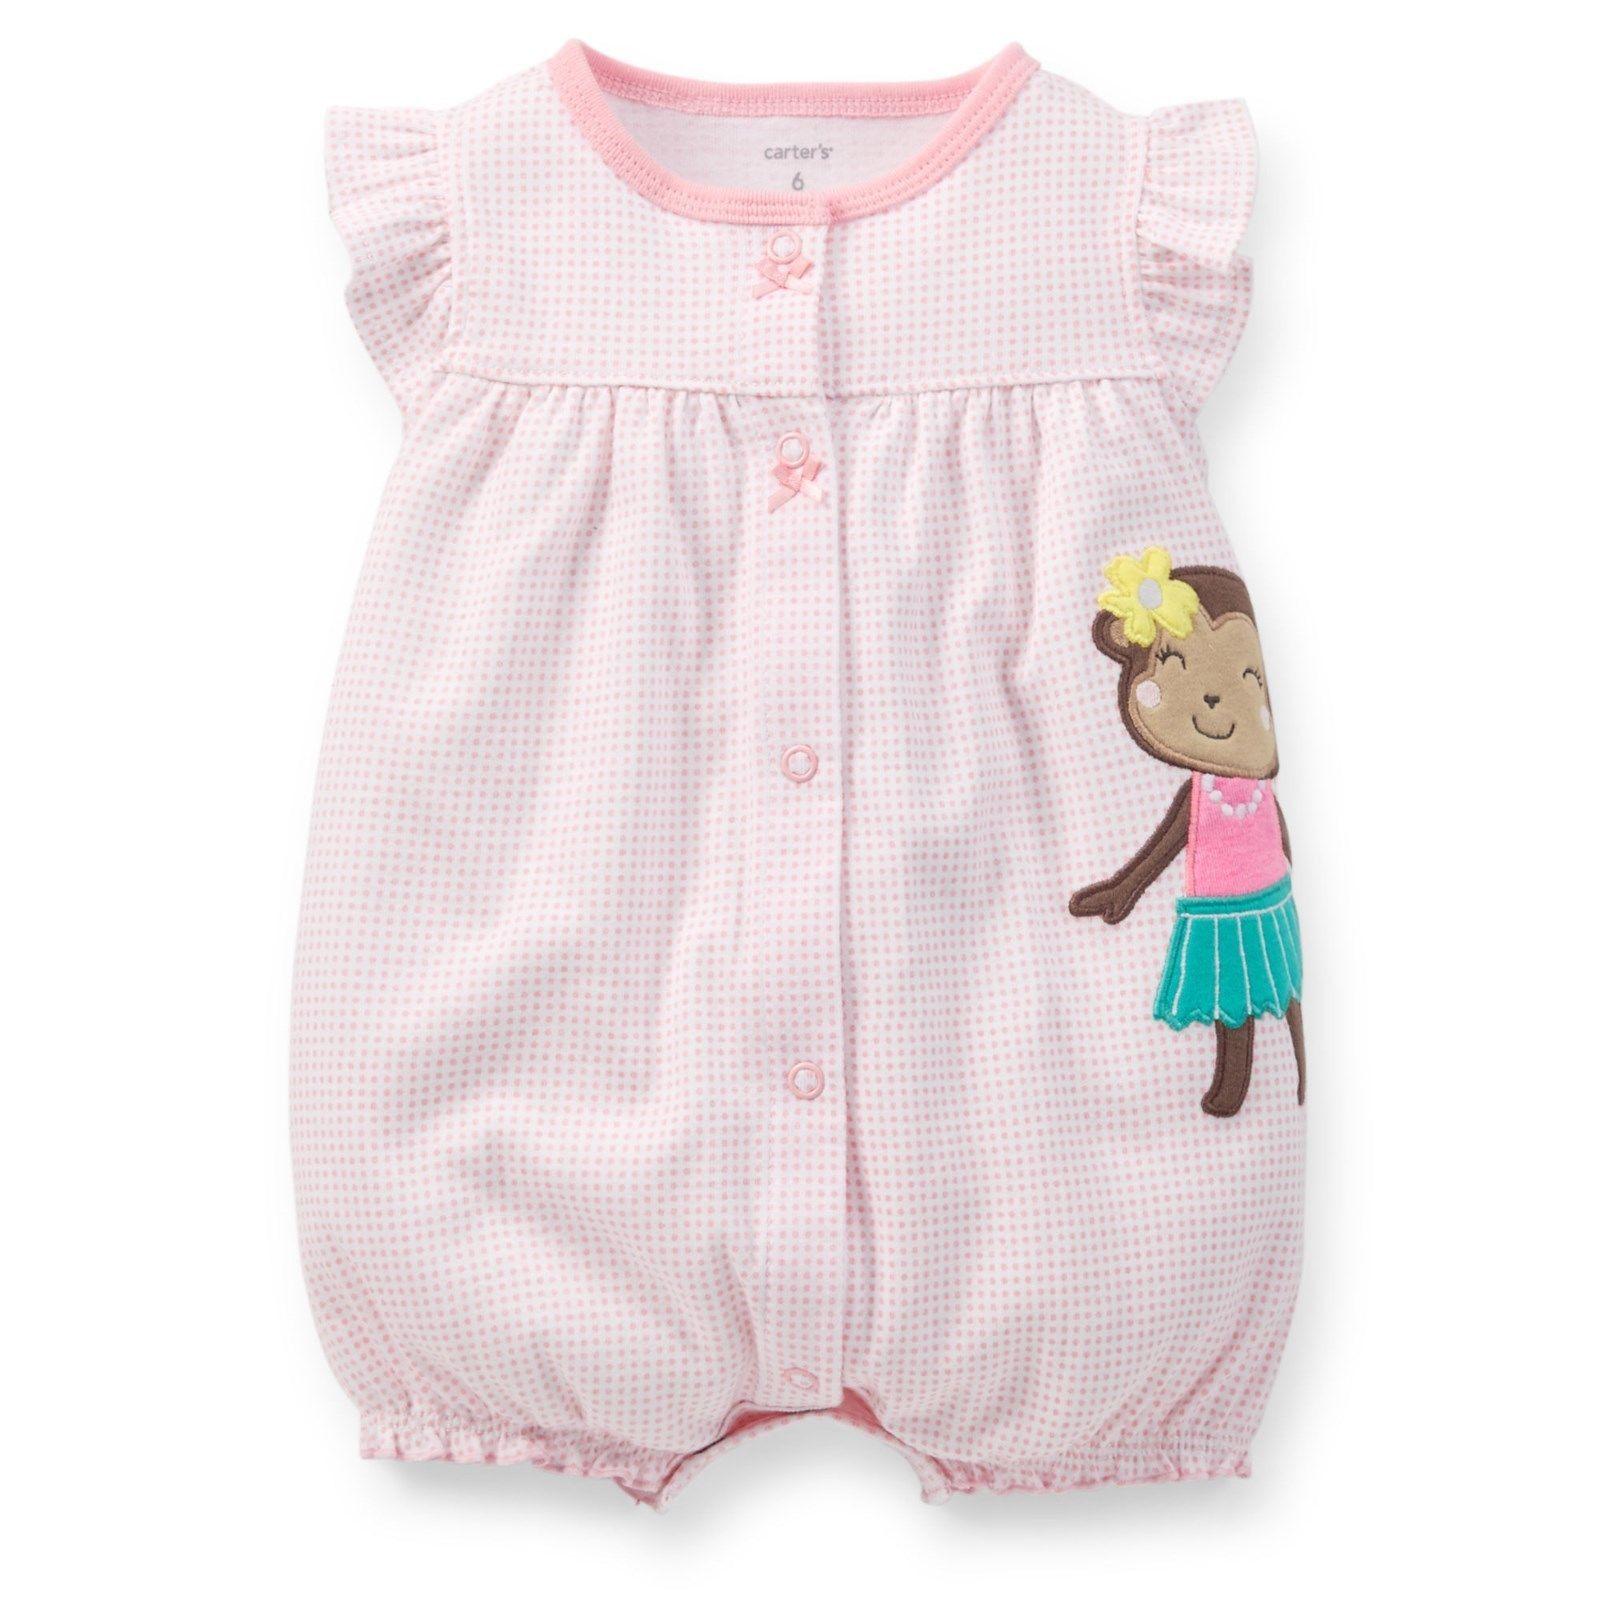 f80db4ebd Carter's Girls Monkey Applique Summer Romper Outfit Nwt 6M 9M 12M 18M 24M